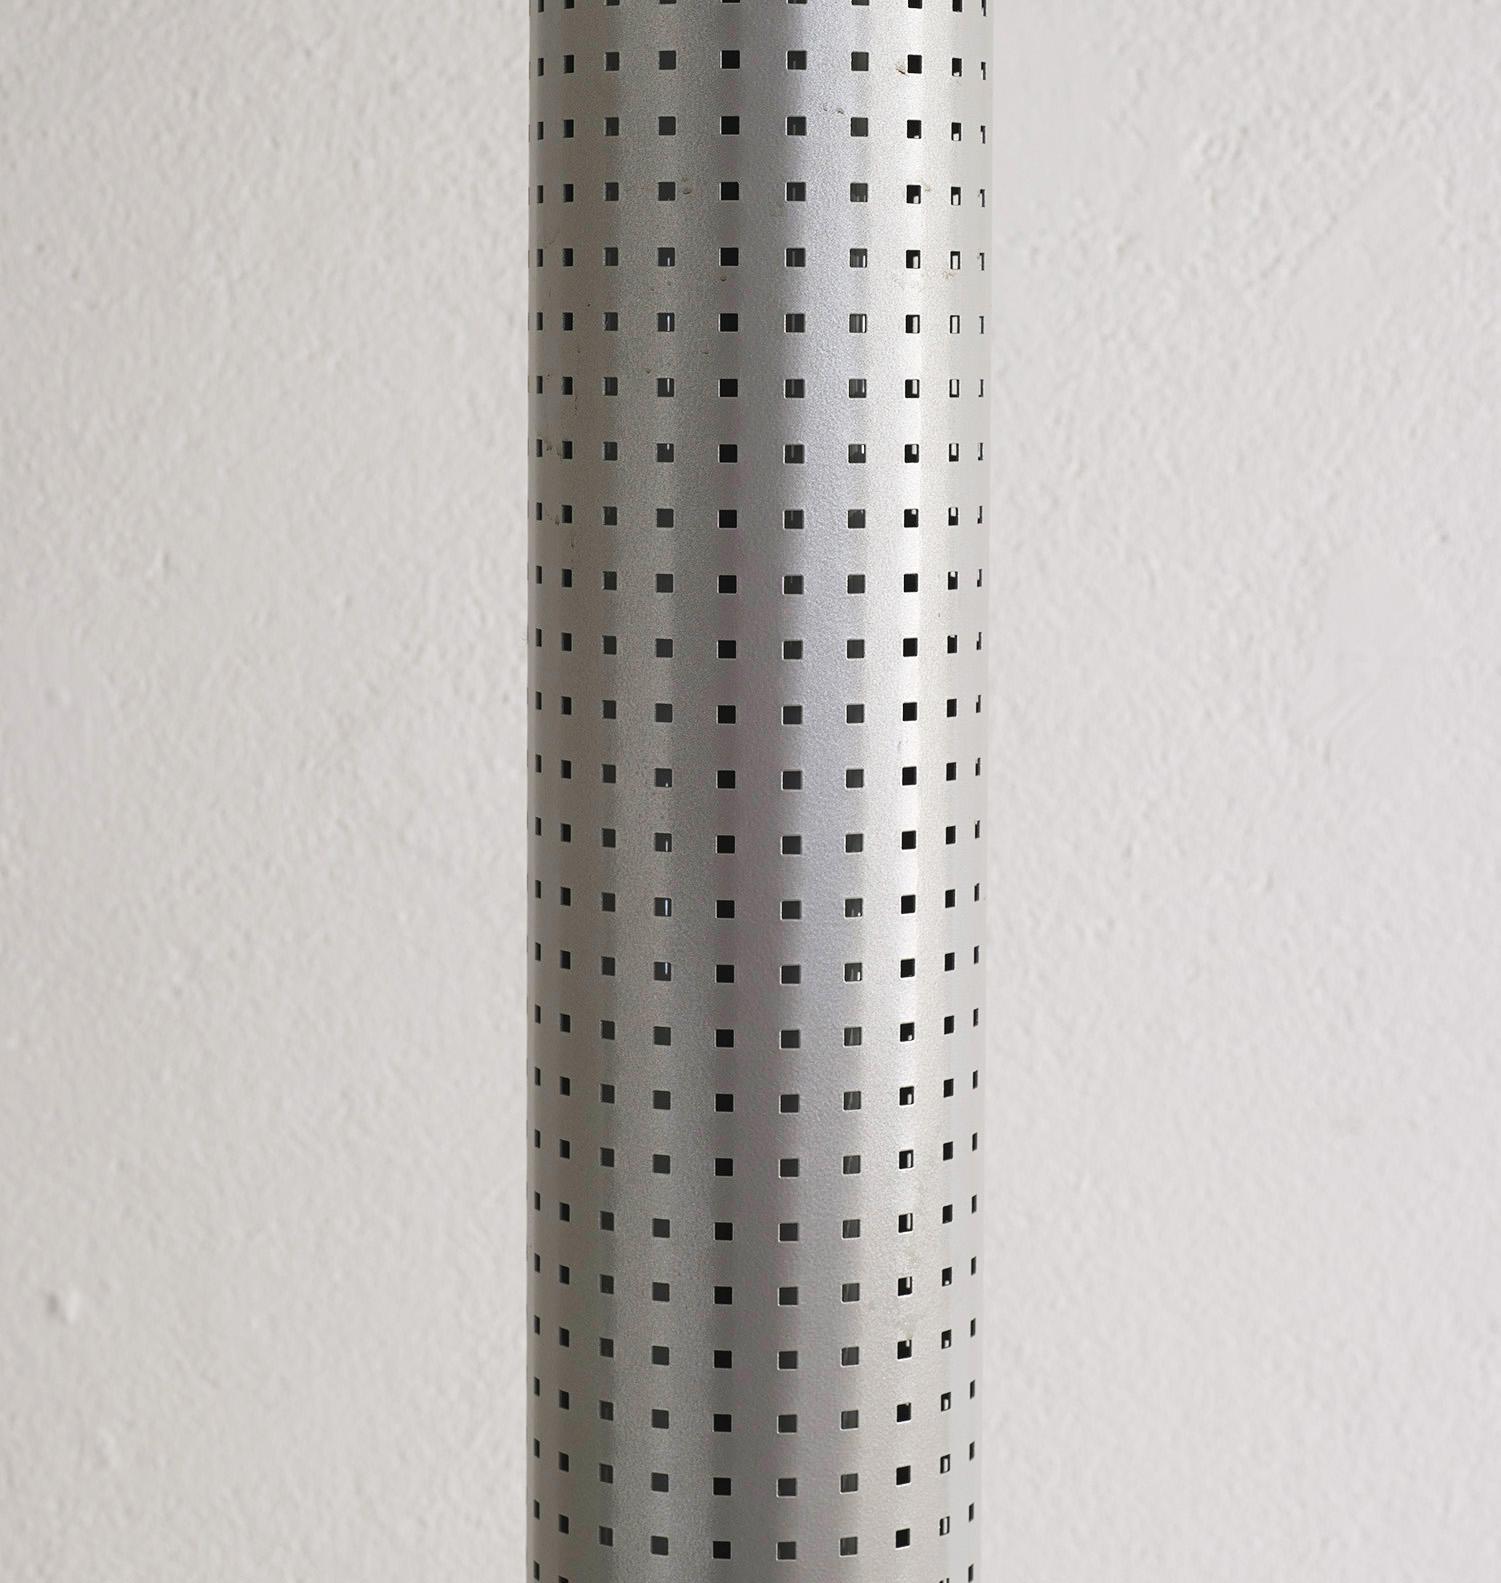 floor-lamp-chicago-tribune-by-matteo-thun-and-andrea-lera-image-06